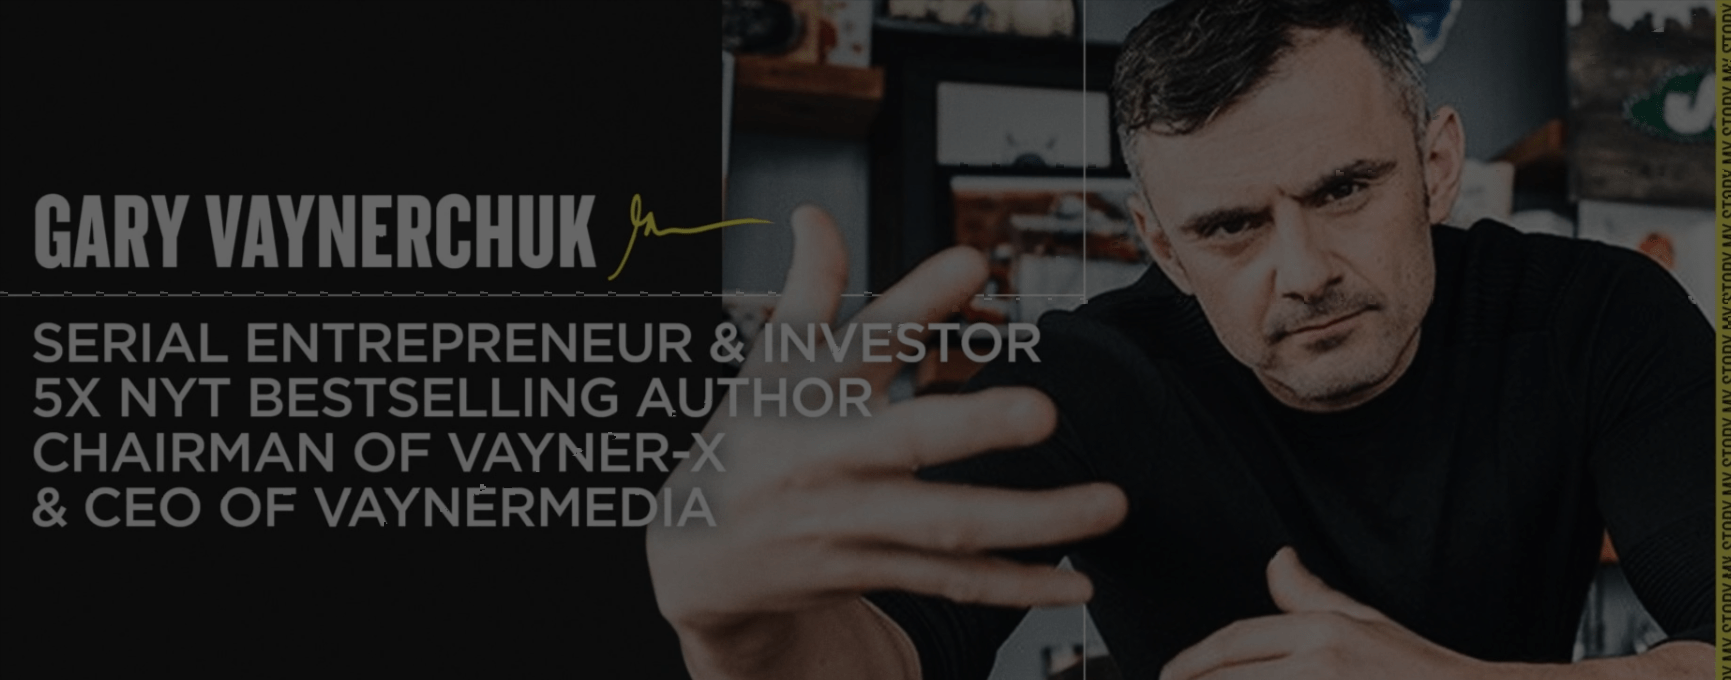 Gary Vaynerchuk Biography